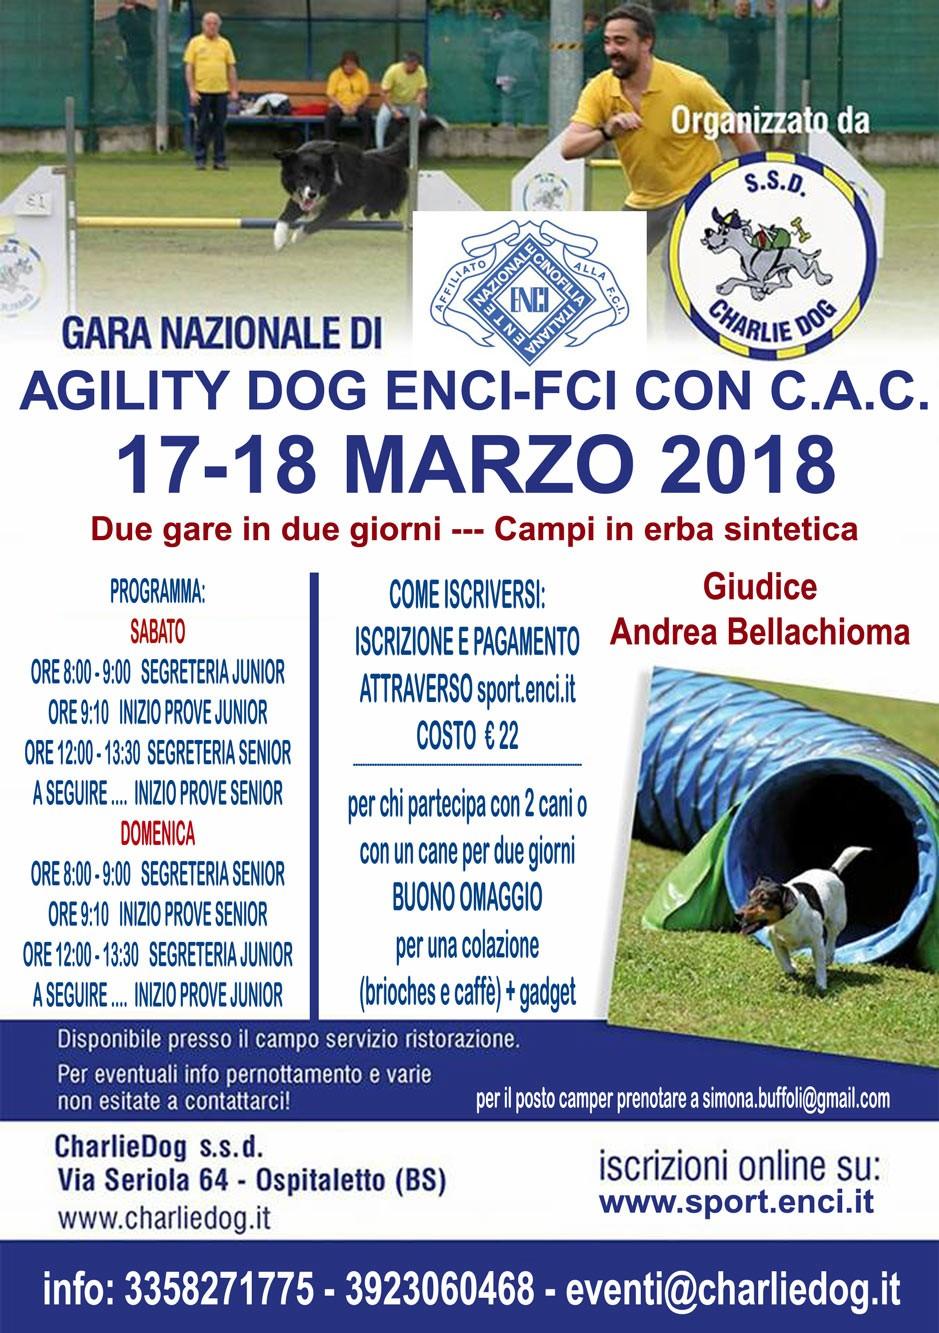 GARA NAZIONALE DI AGILITY CHARLIE DOG 17 MARZO